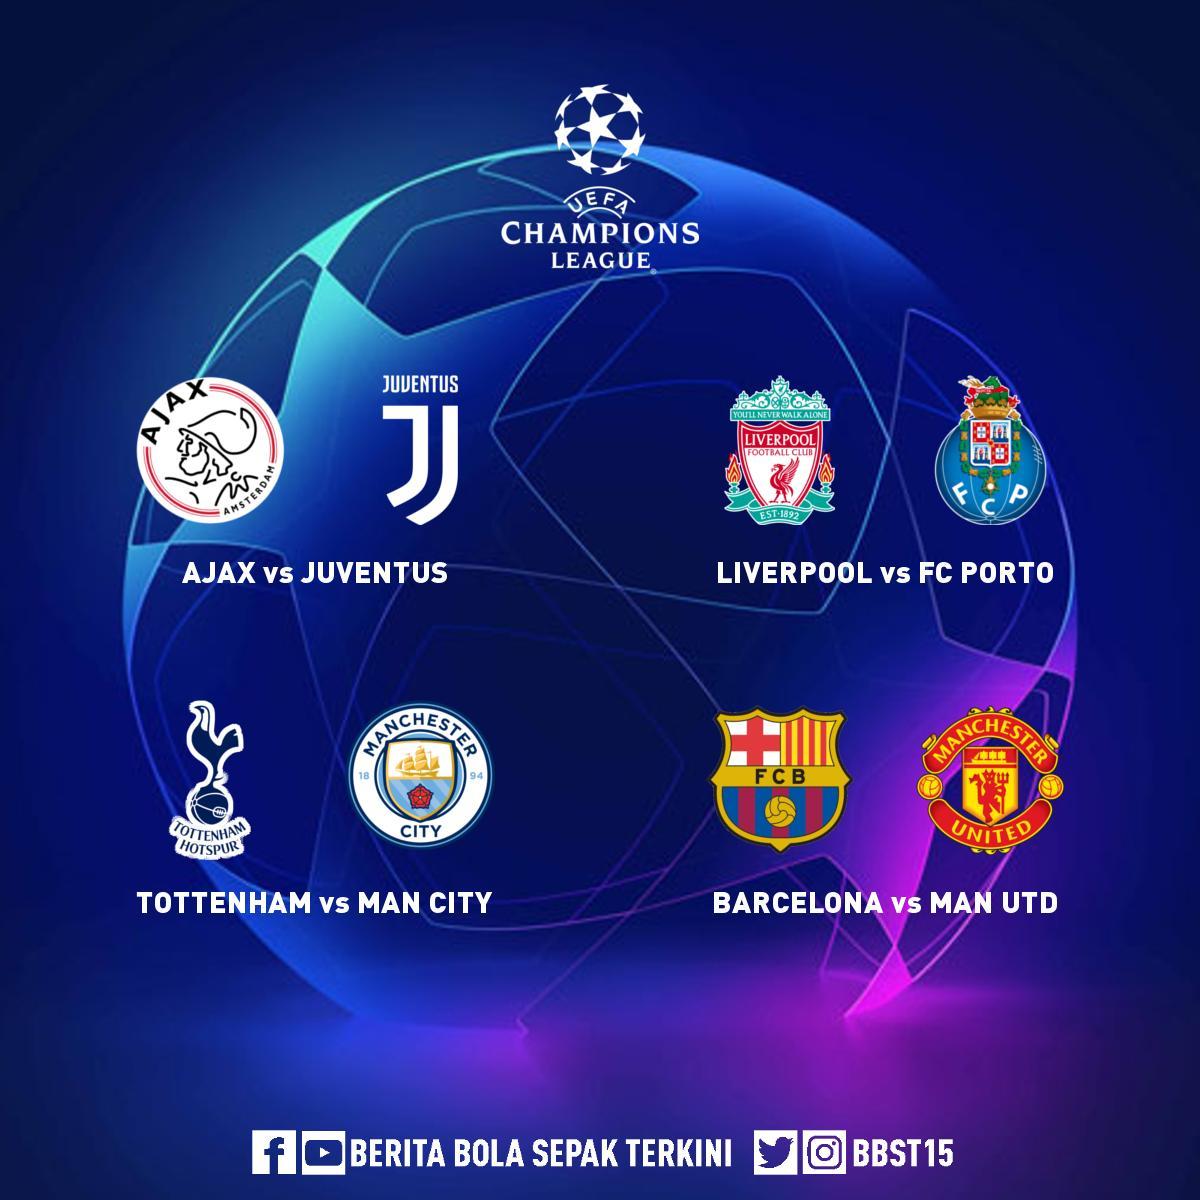 Berita Bola Sepak 🇲🇾's photo on Manchester City